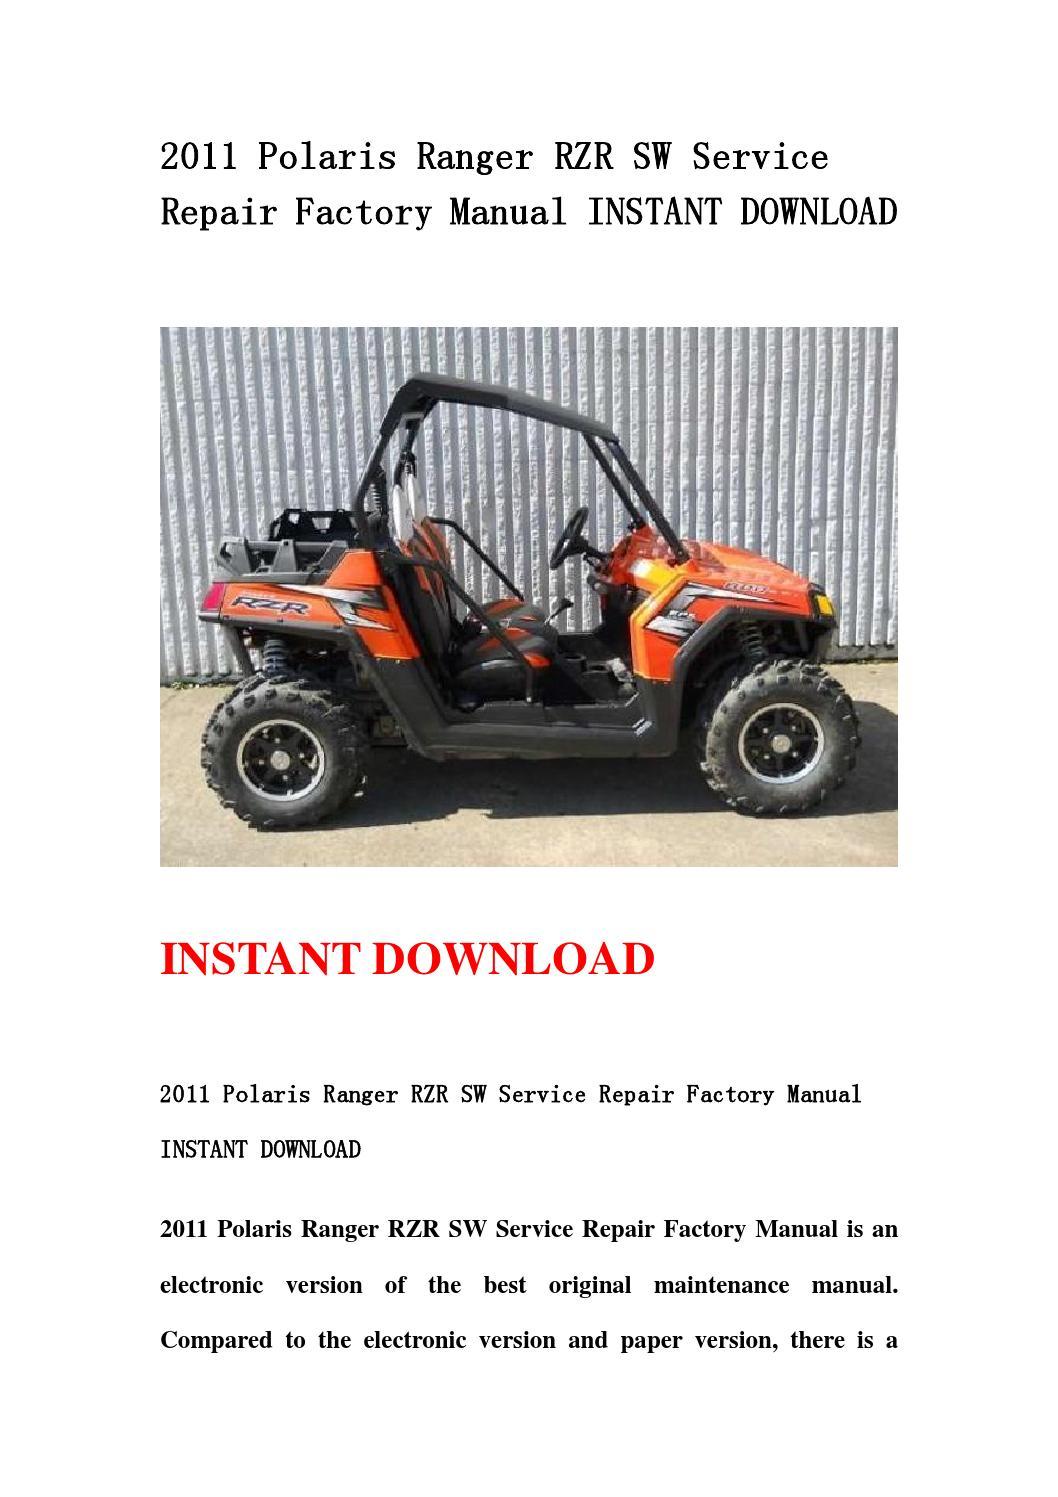 2011 Polaris Ranger Rzr Sw Service Repair Factory Manual